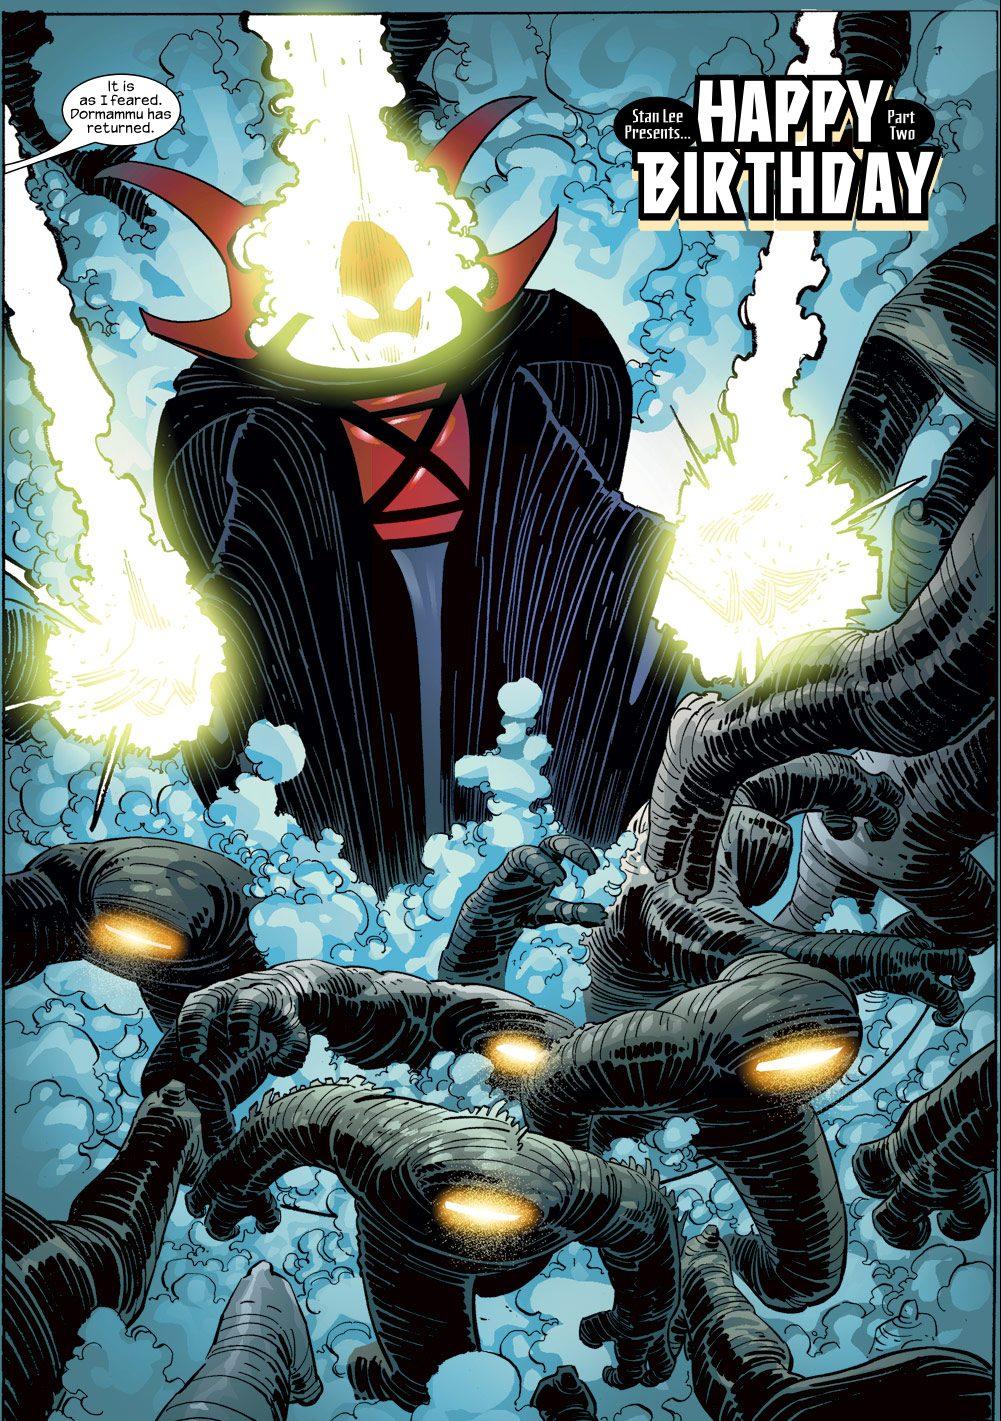 Dormammu (The Amazing Spider-Man Vol. 2 #58)